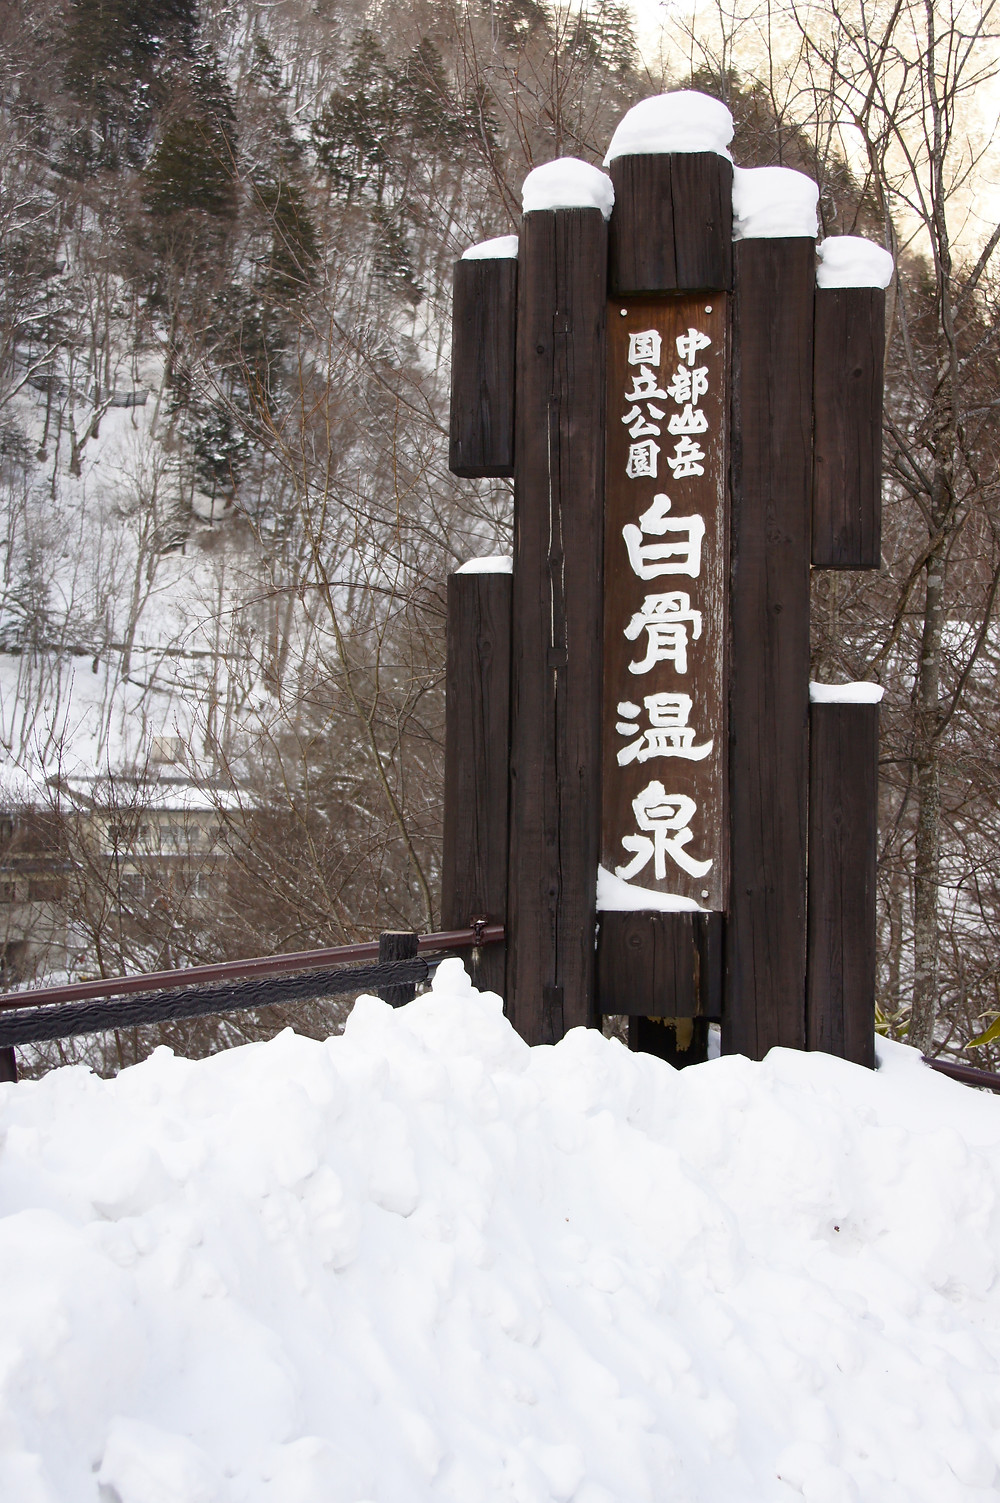 Metros de neve costumam se empilhar no invermo de Shirahone Onsen.